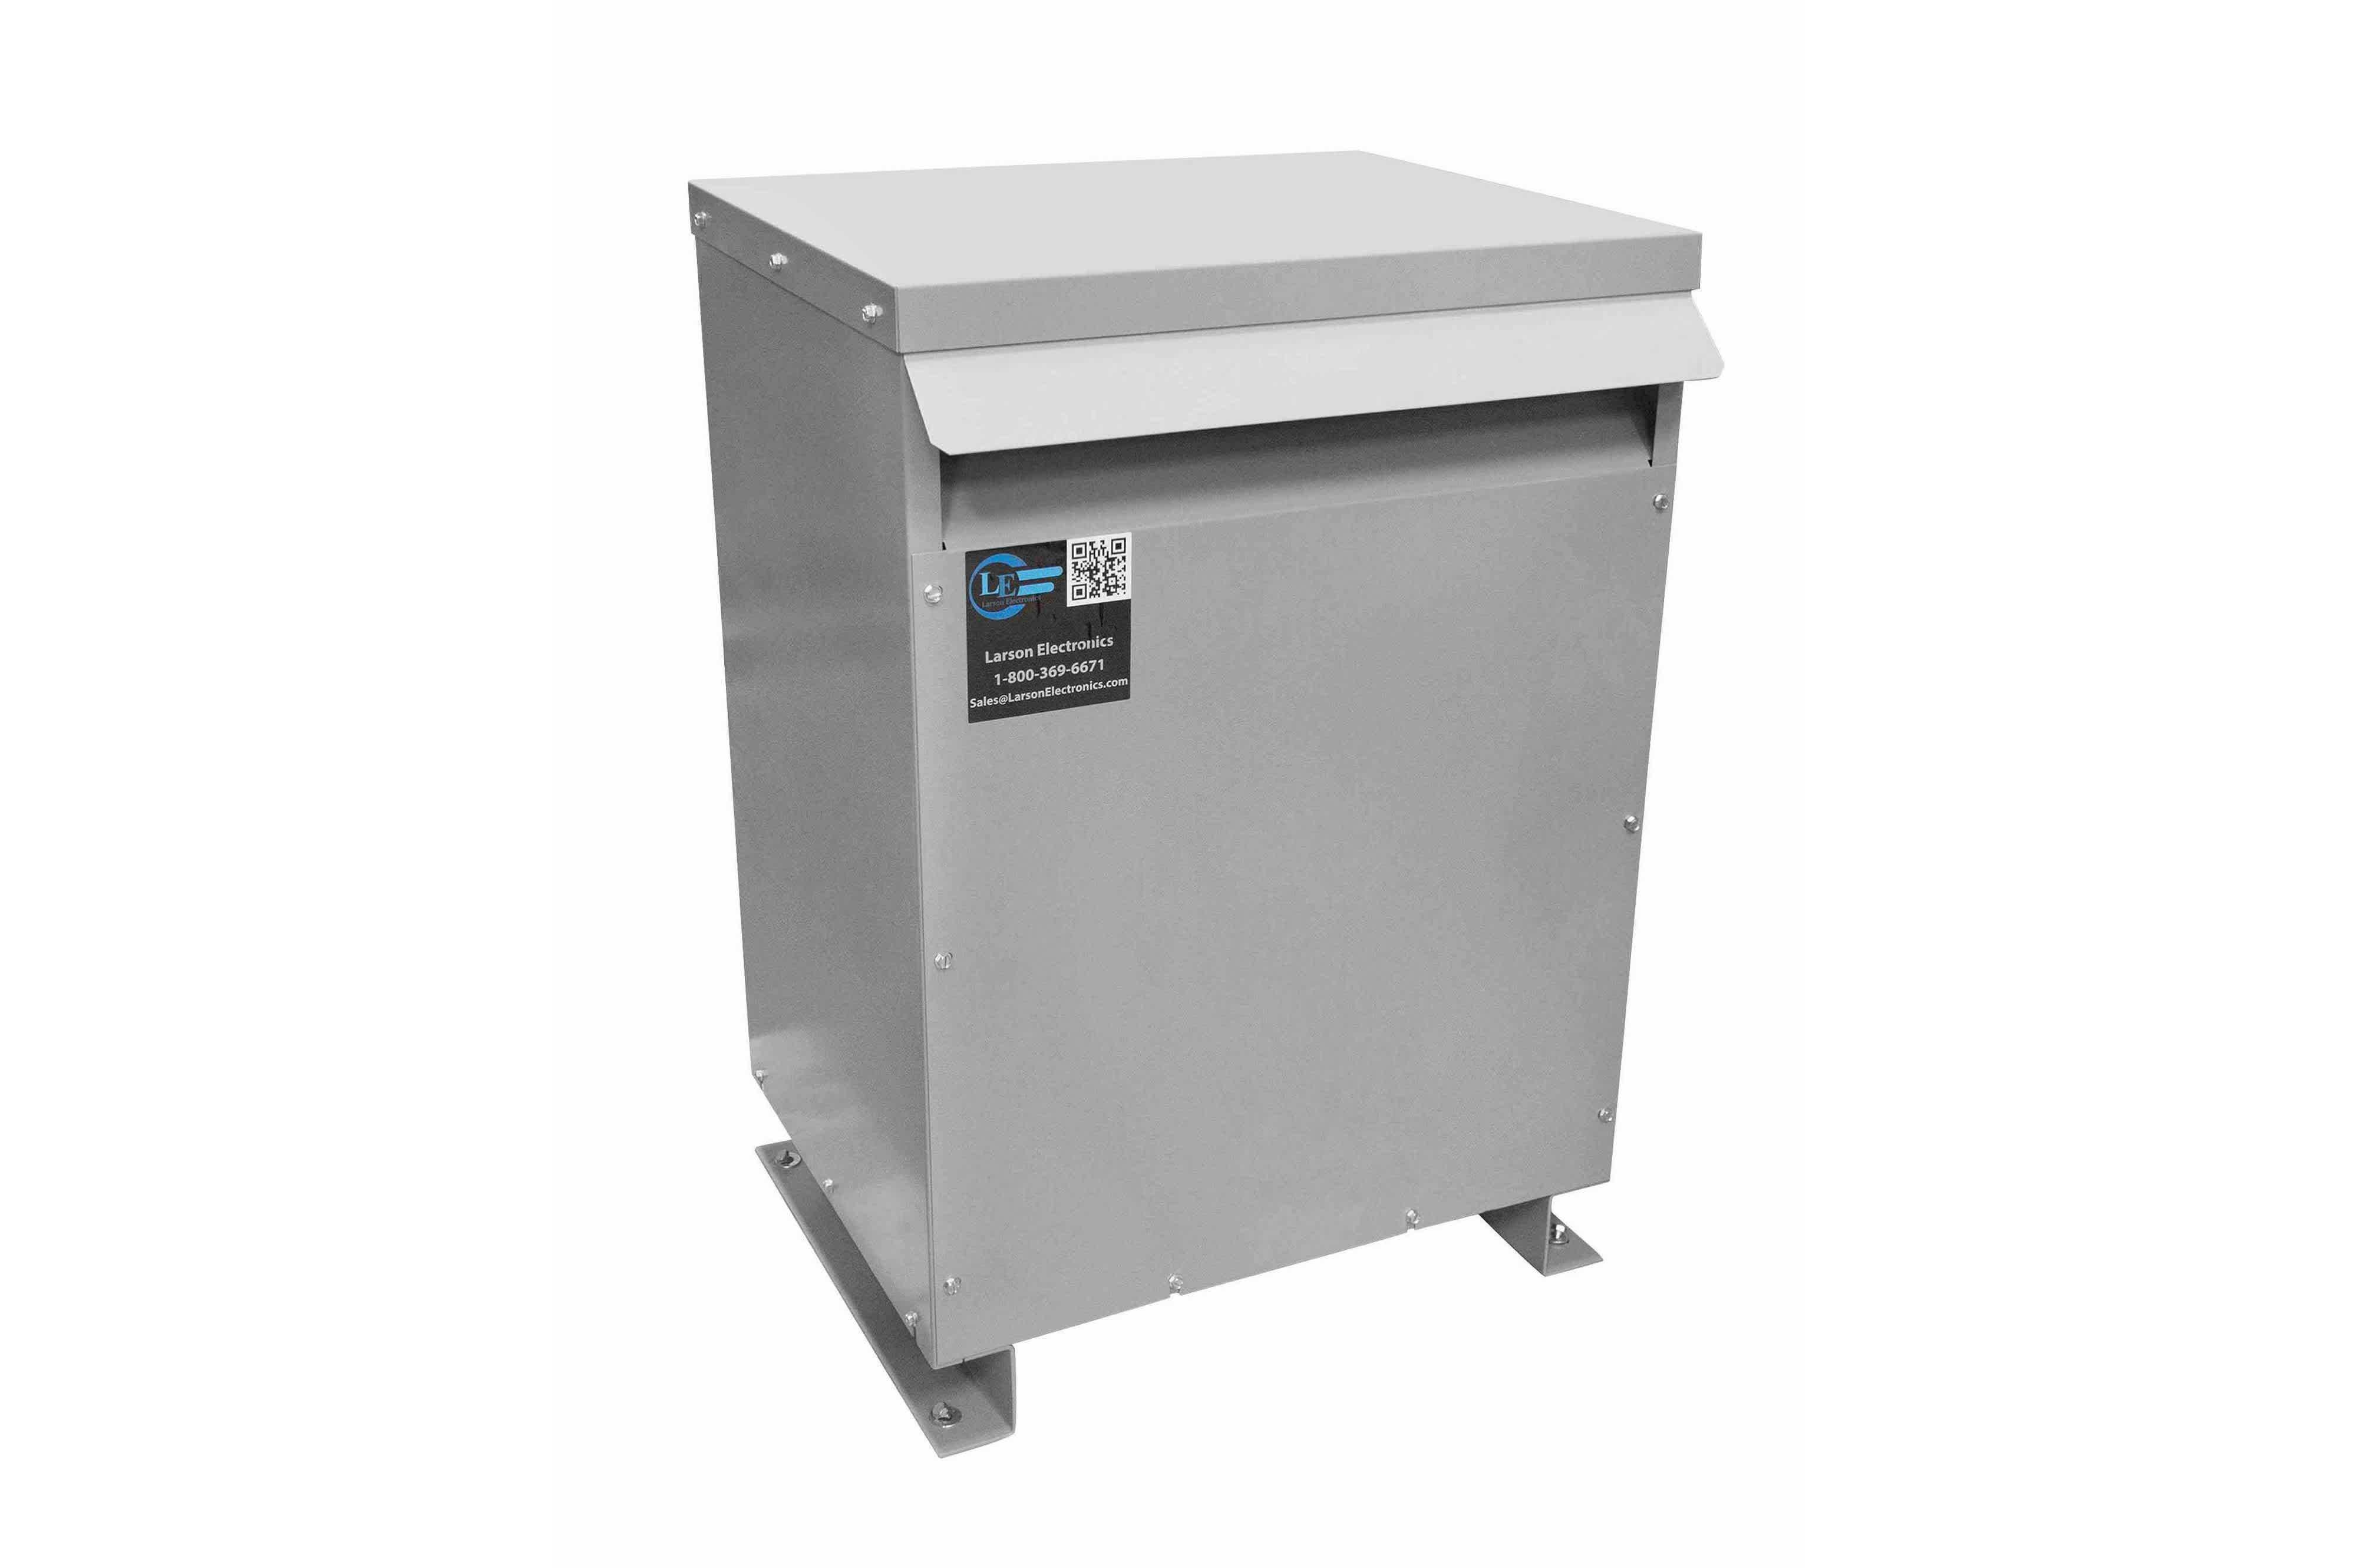 65 kVA 3PH Isolation Transformer, 208V Wye Primary, 400V Delta Secondary, N3R, Ventilated, 60 Hz